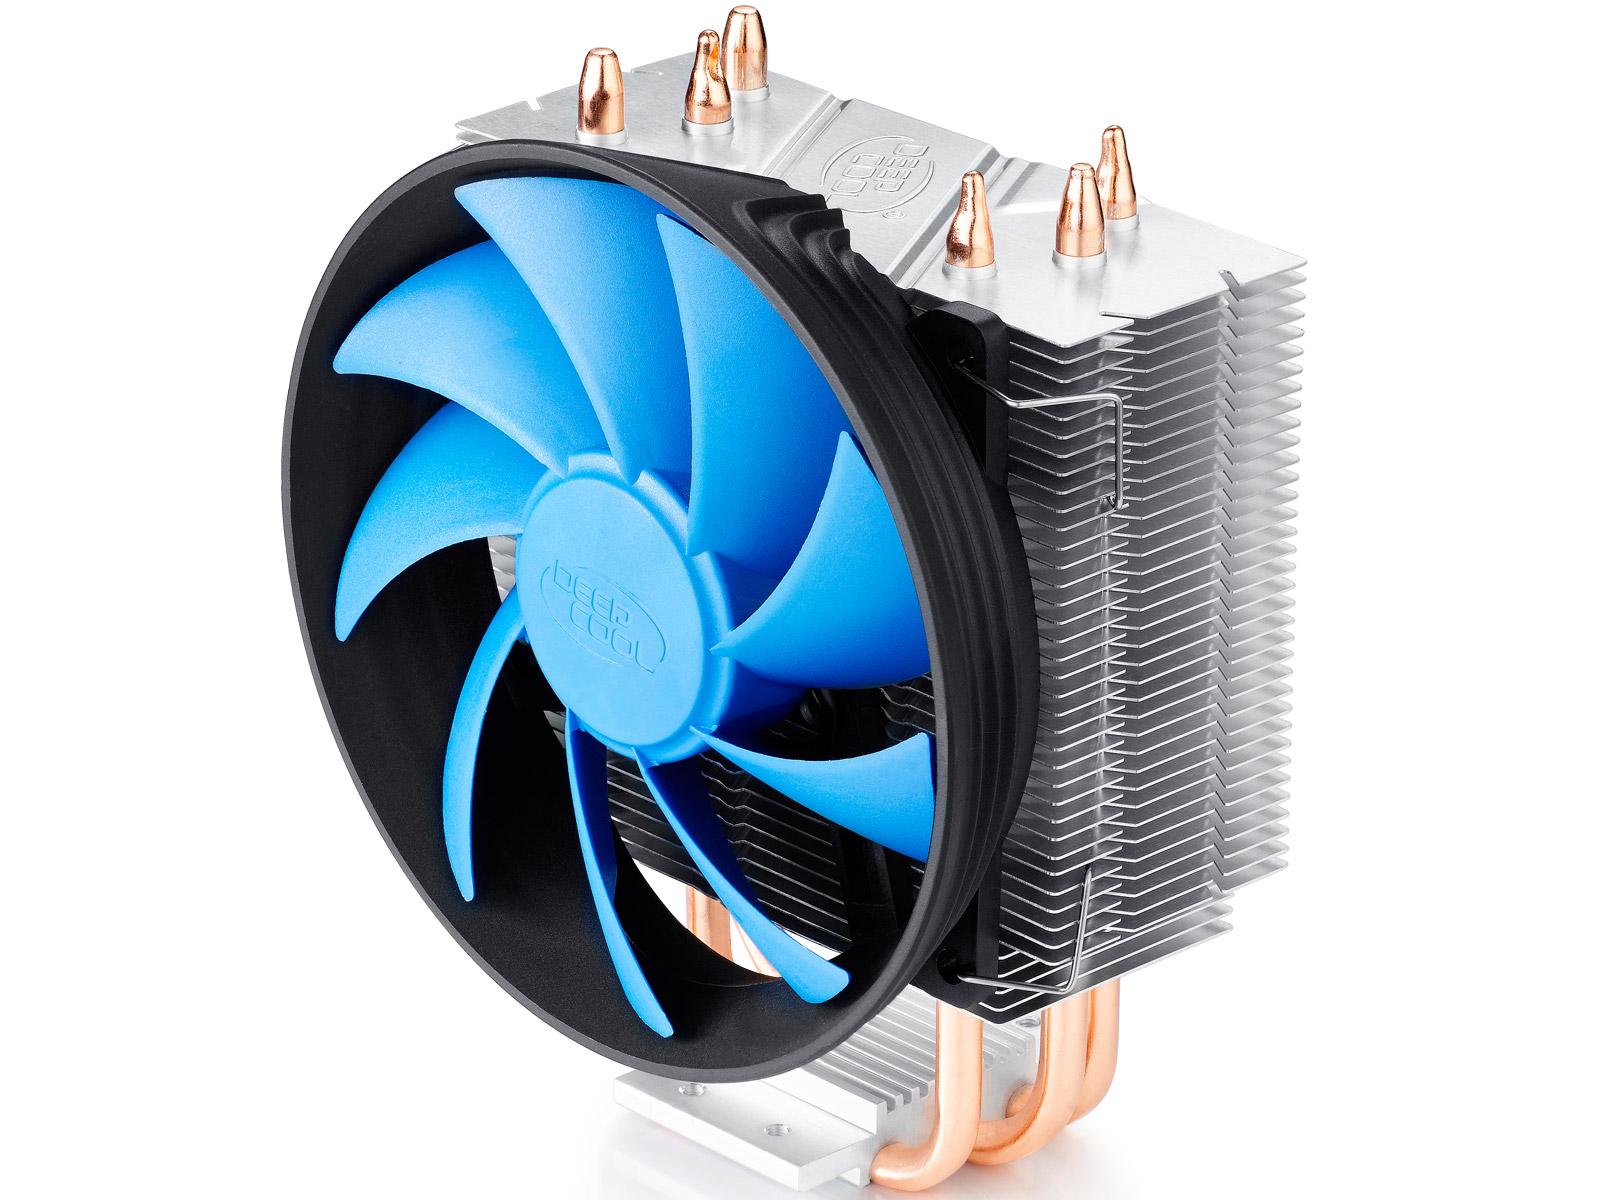 Кулер для процессора Deep Cool GAMMAXX 300 1366/1156/775/ FM1 All Series/AM2/AM3/AM4 3 тепловые трубки+Медное основание TDP: 130Вт compatible projector lamp shp113 tlp lw15 for toshiba tdp ew25 tdp ew25u tdp ex21 tdp sb20 tdp st20 tdp ex20 tdp ex20u tlplw15